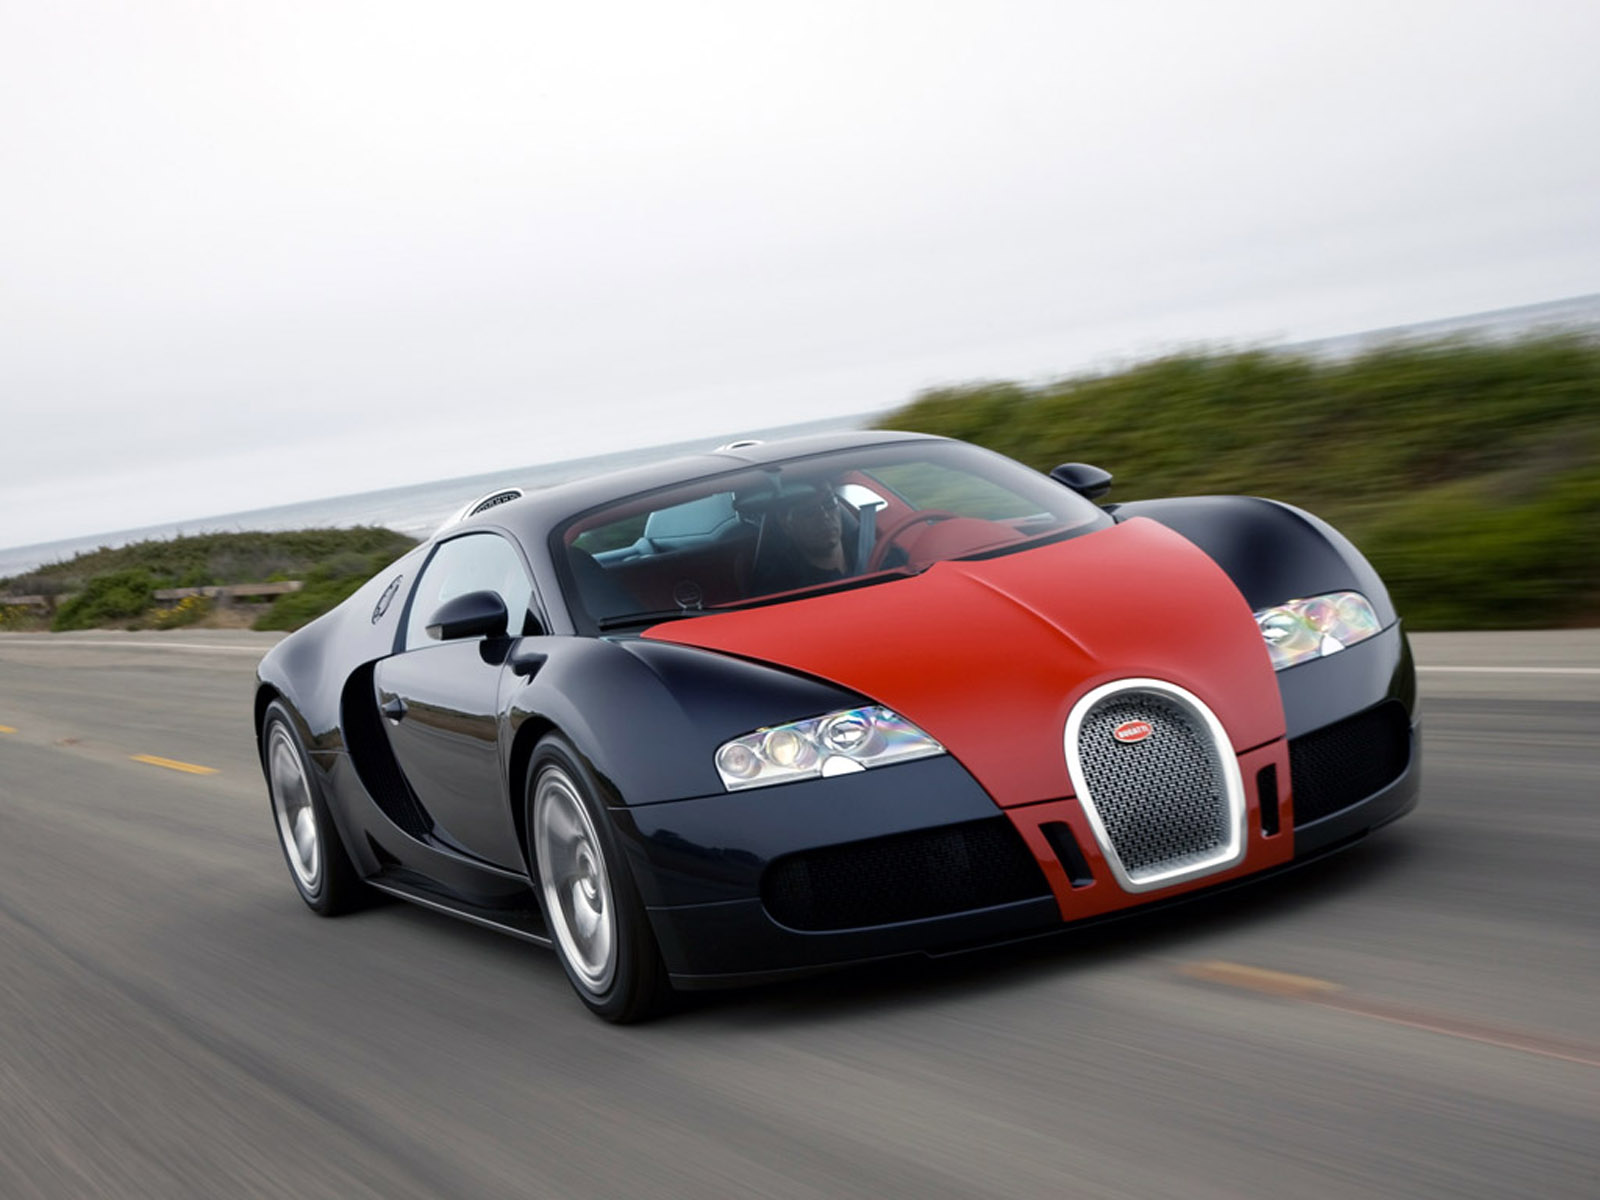 2009-bugatti-164-veyron-fbg-par-hermes-full-view Wonderful Bugatti Veyron On Road Price Cars Trend